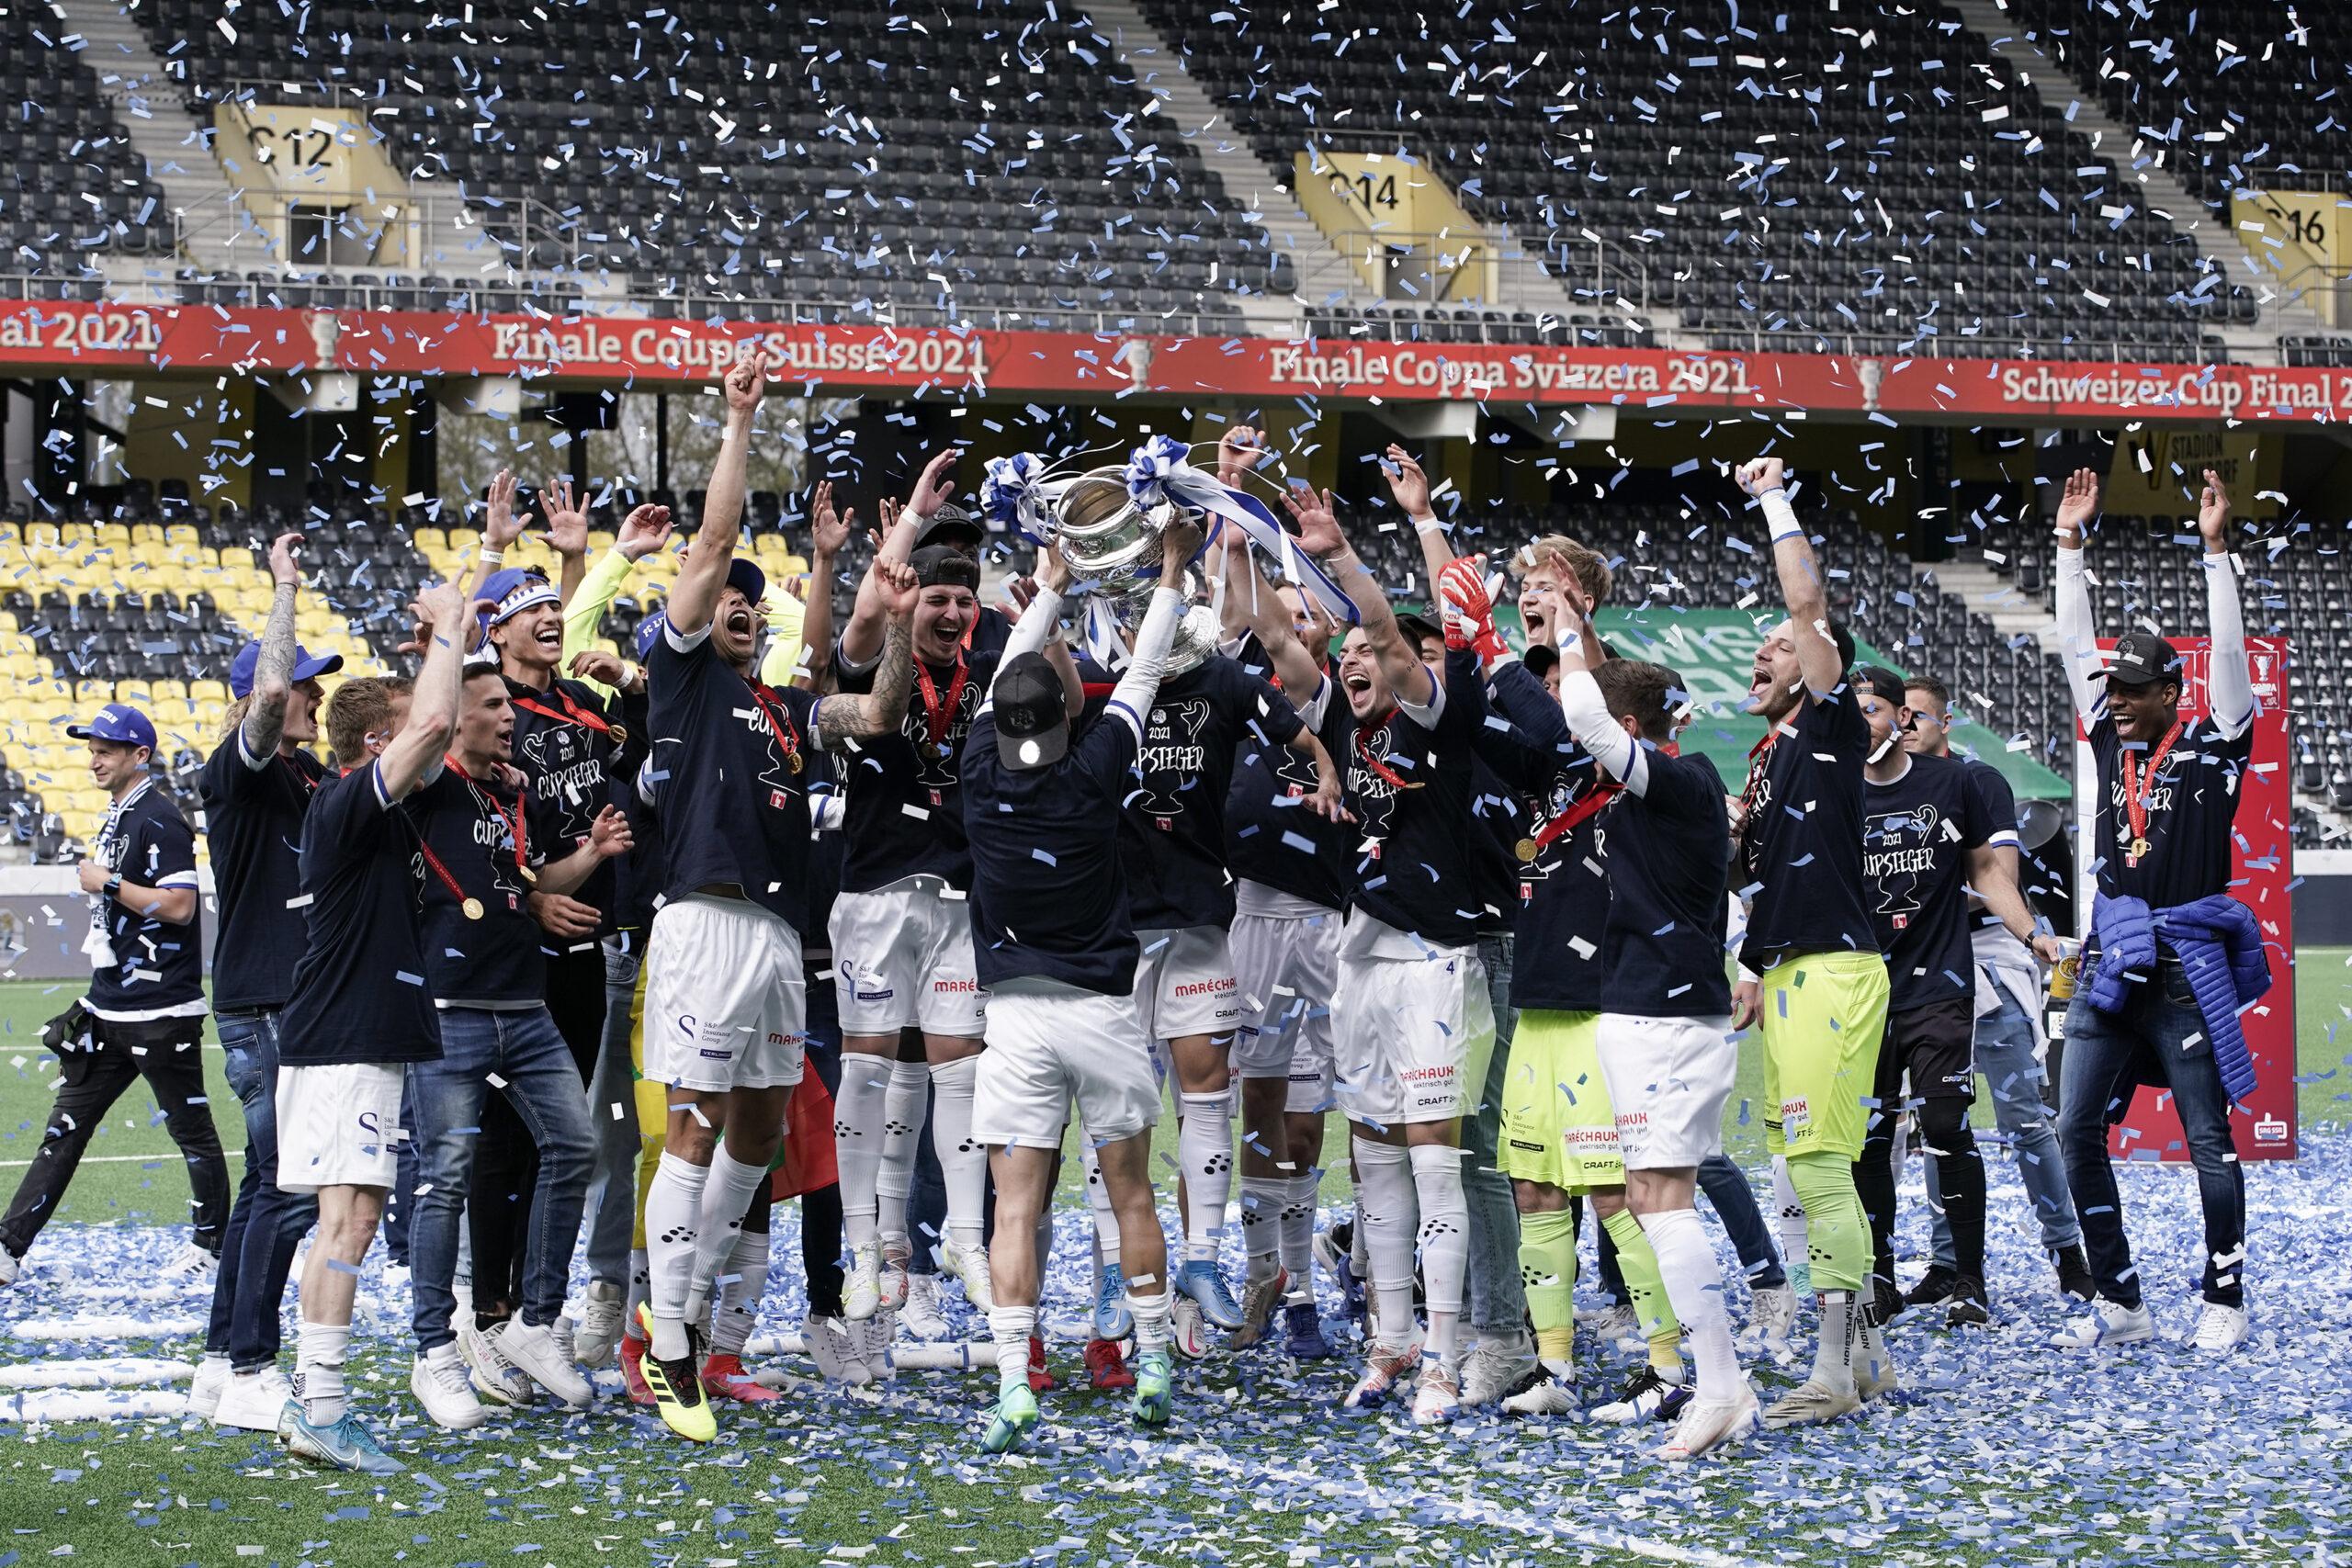 24.05.2021; Bern; FUSSBALL SCHWEIZER CUP - FC St. Gallen - FC Luzern; Pokaluebergabe (Martin Meienberger/freshfocus)